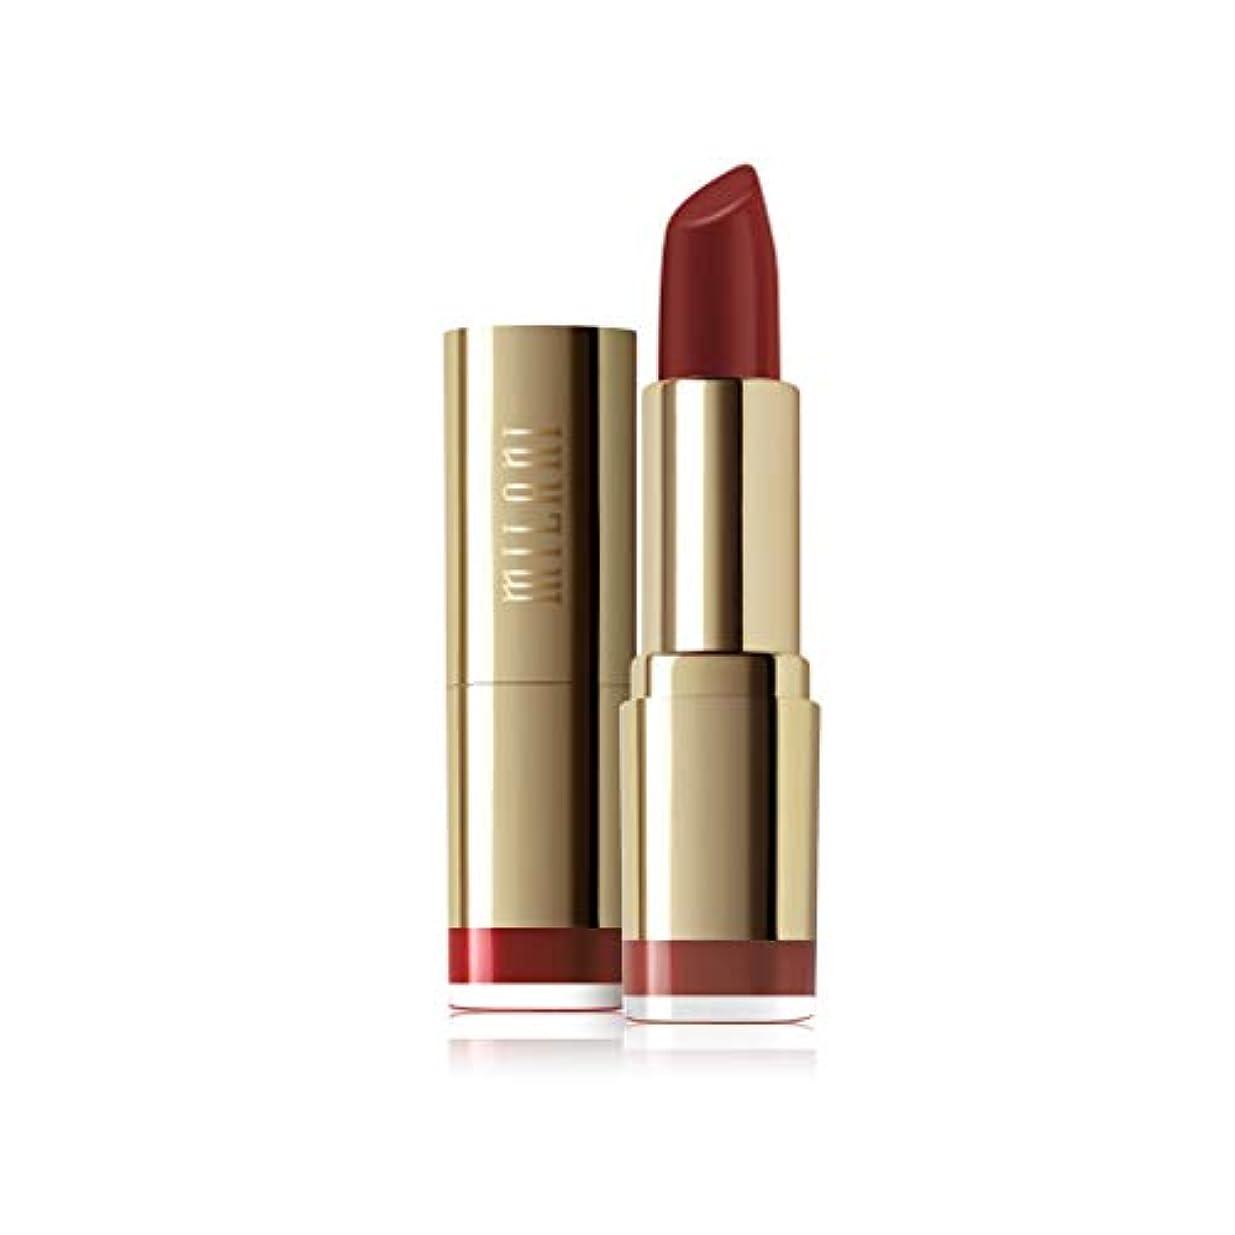 MILANI Color Statement Lipstick - Tuscan Toast (並行輸入品)